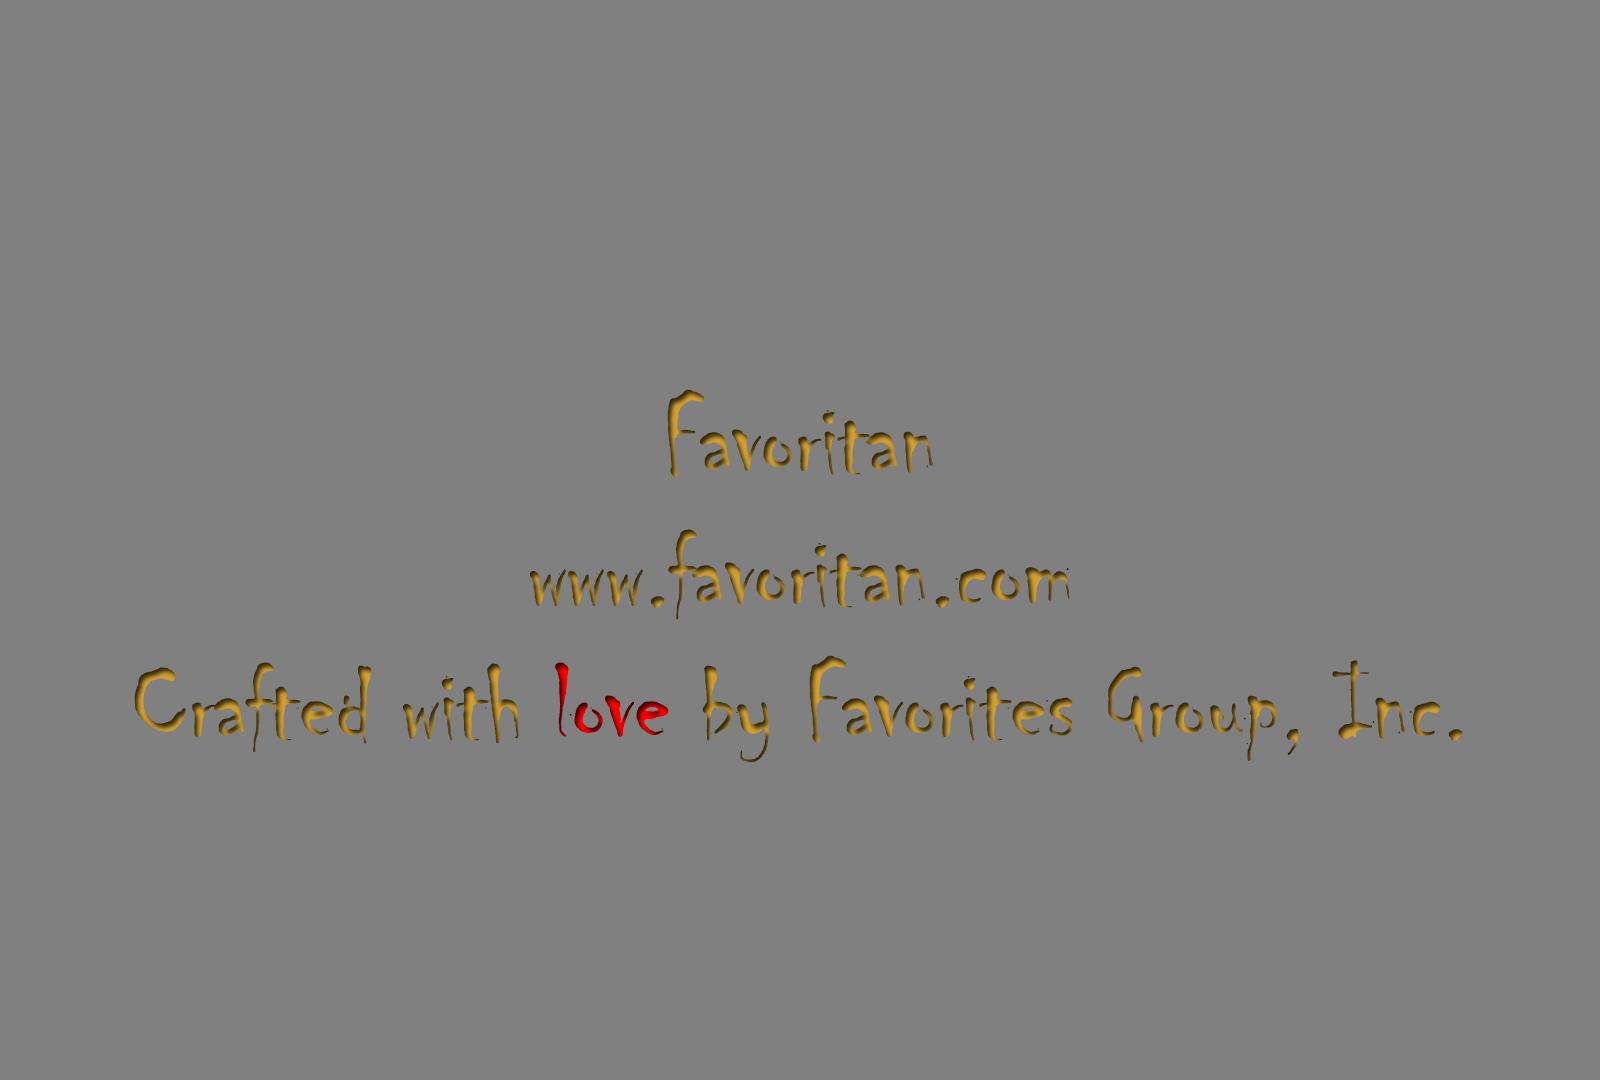 favoritan-by-favorites-group-inc